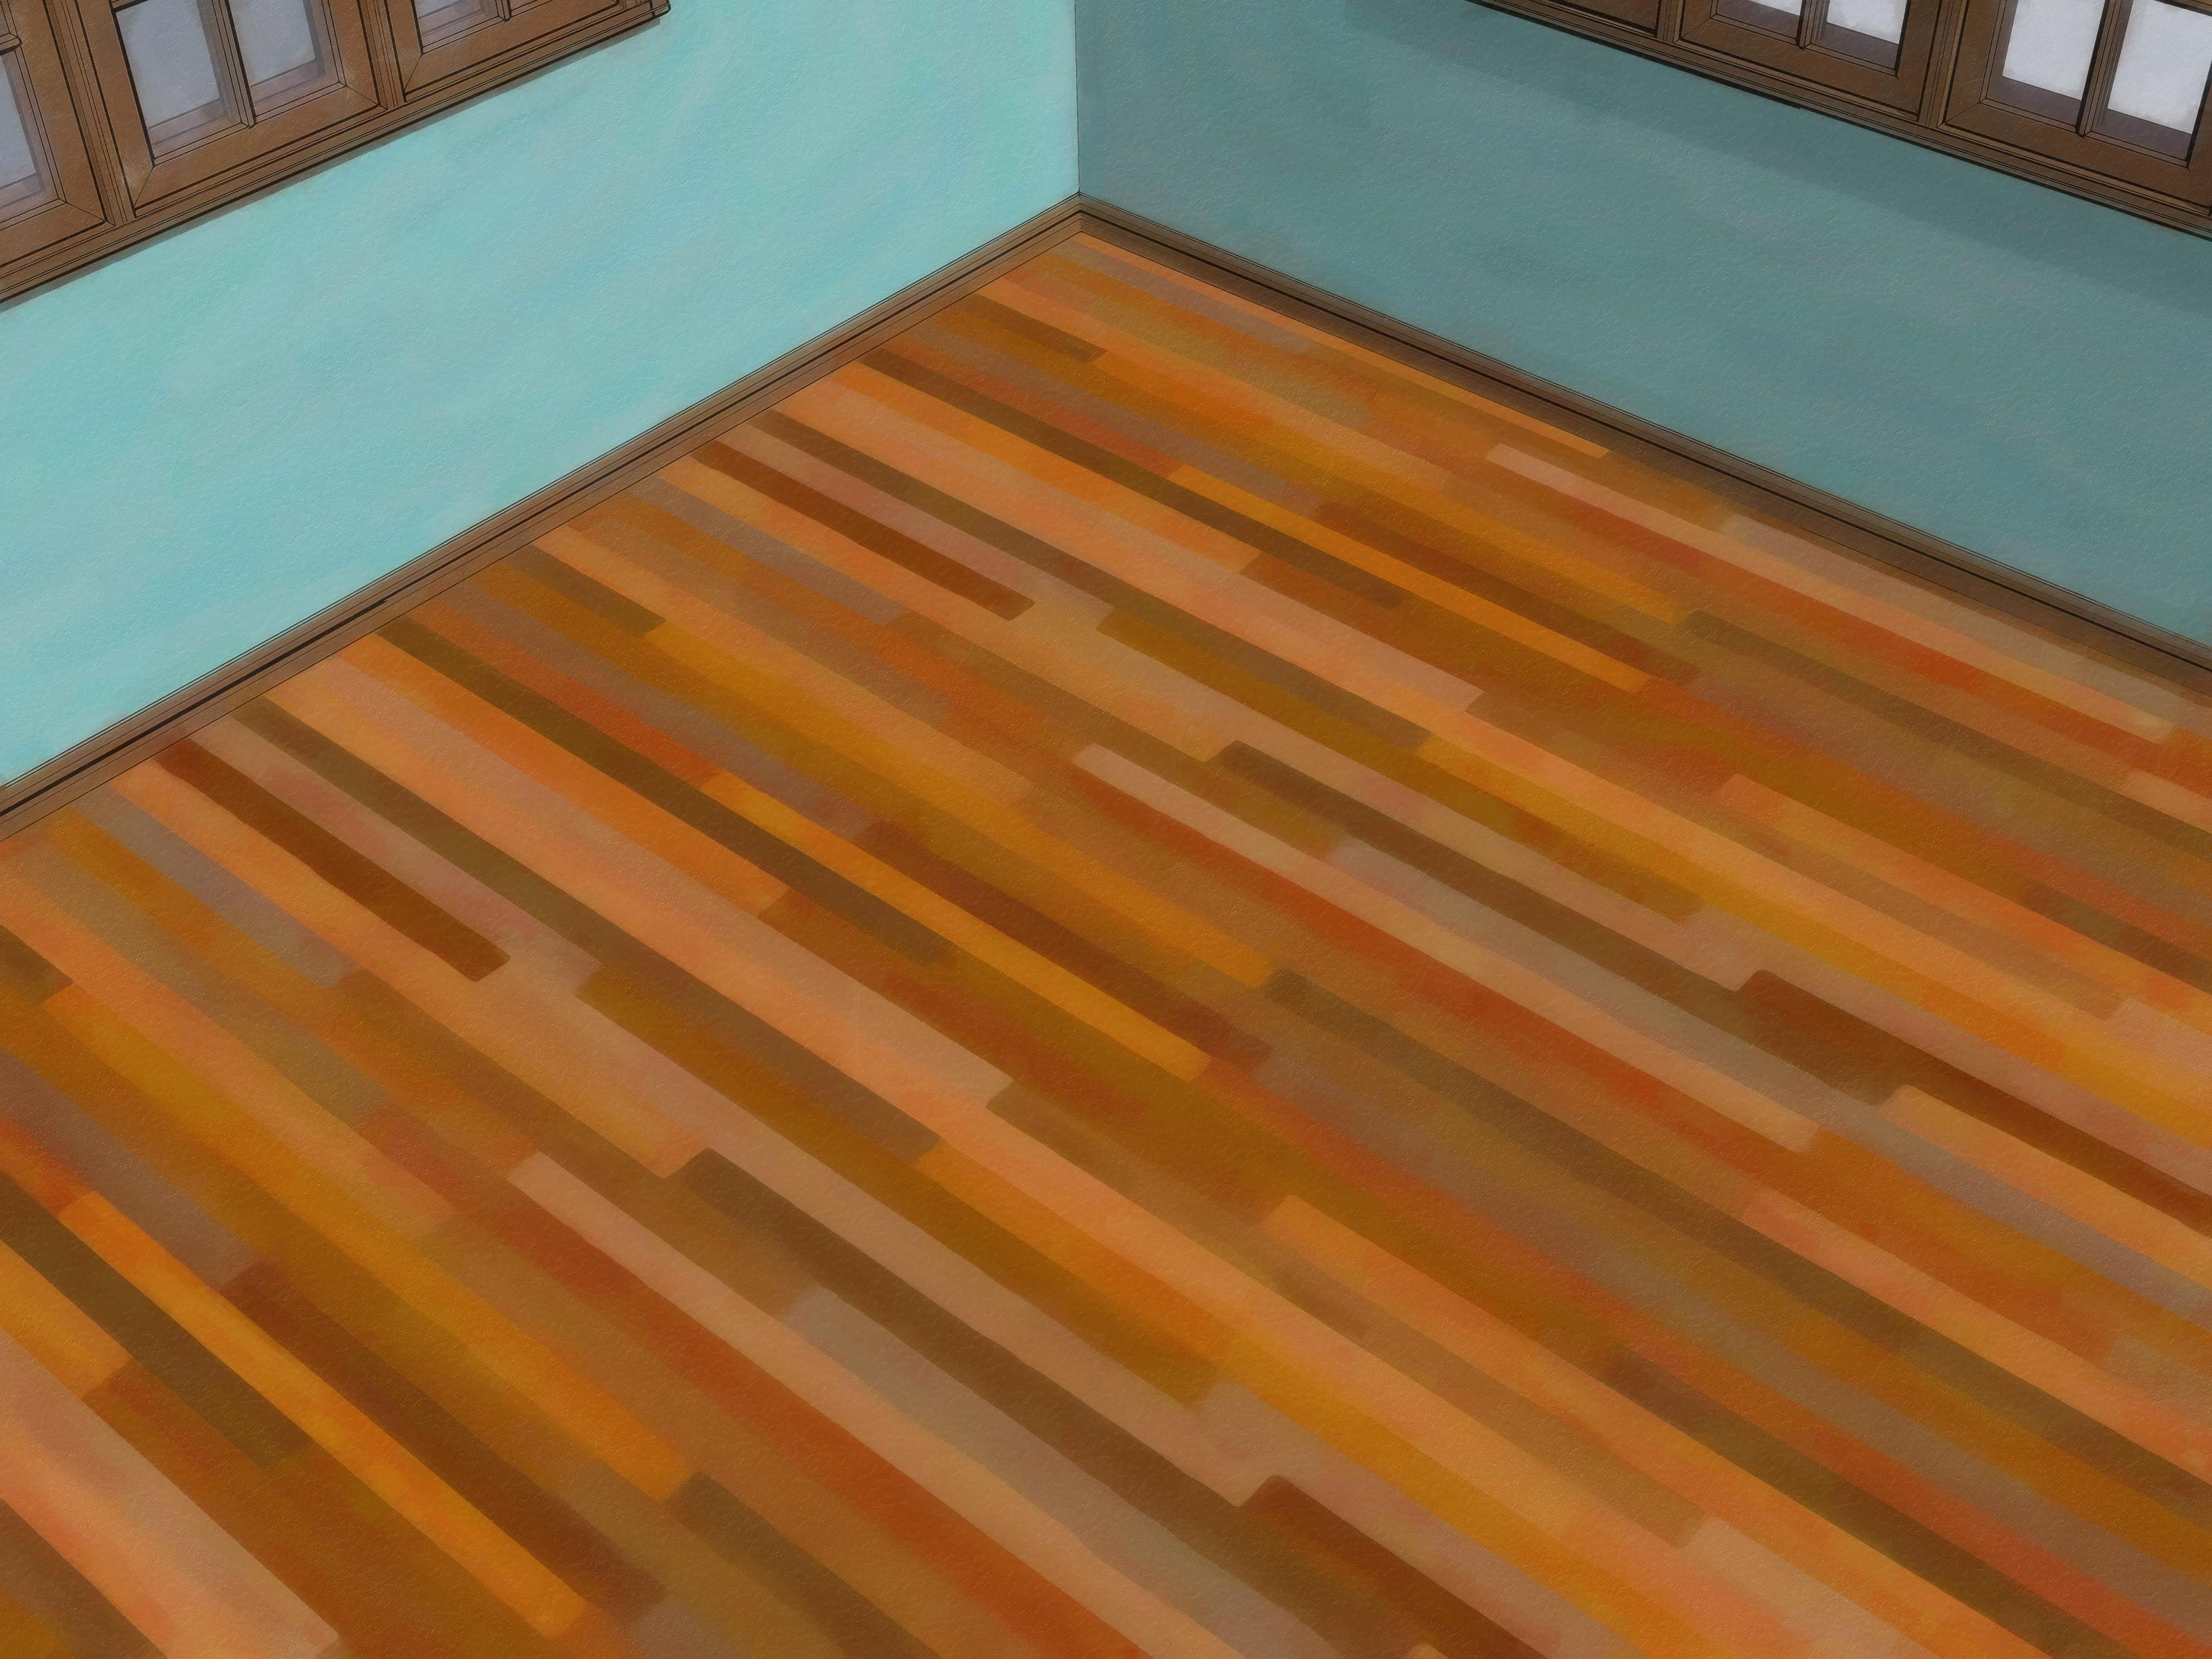 sanding hardwood floors of hardwood flooring how to elegant 50 inspirational sanding and in hardwood flooring how to elegant 50 inspirational sanding and refinishing hardwood floors graphics